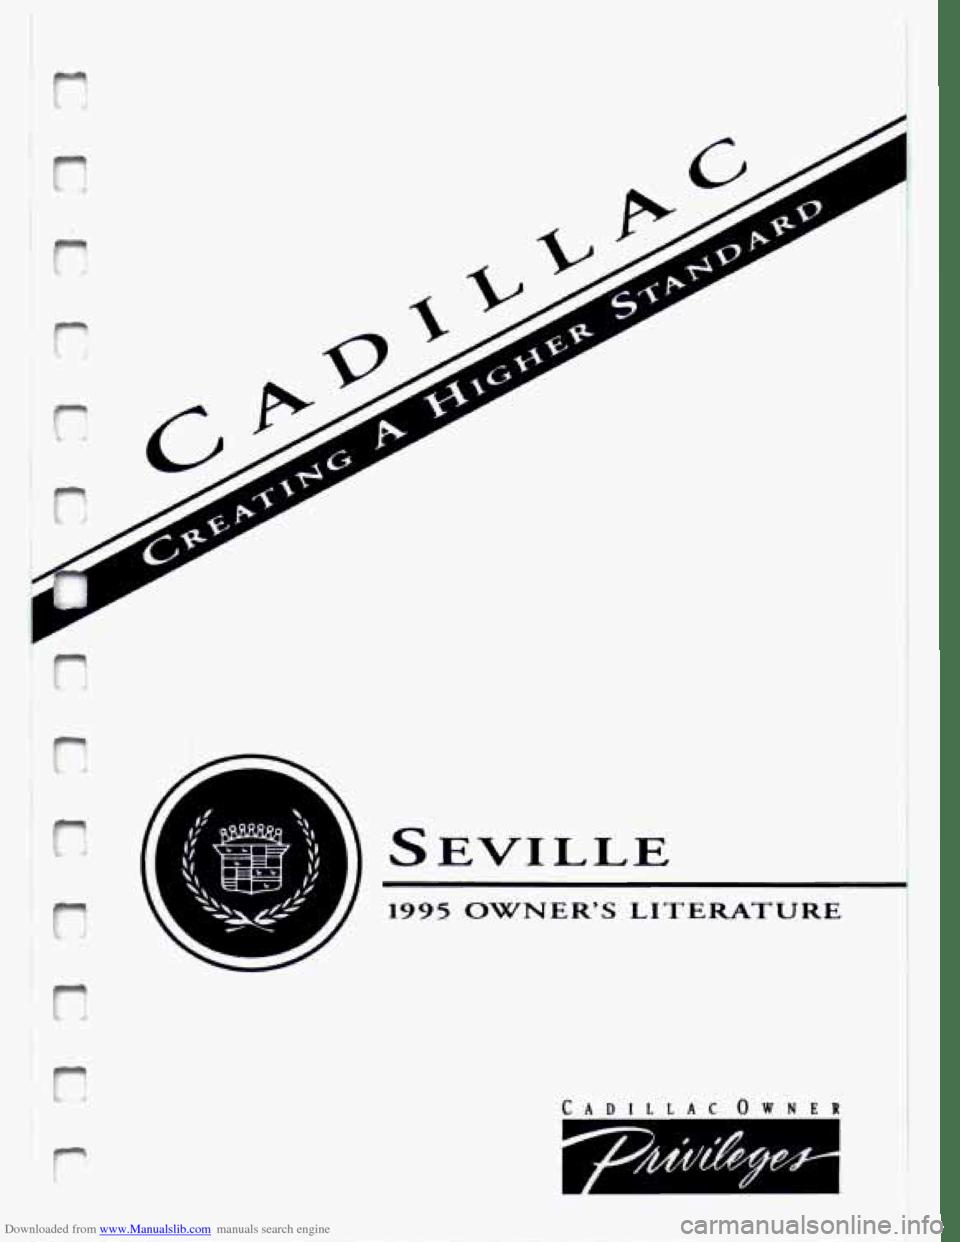 1969 Cadillac Service Manua Pdf : Hammasjones Cadillac